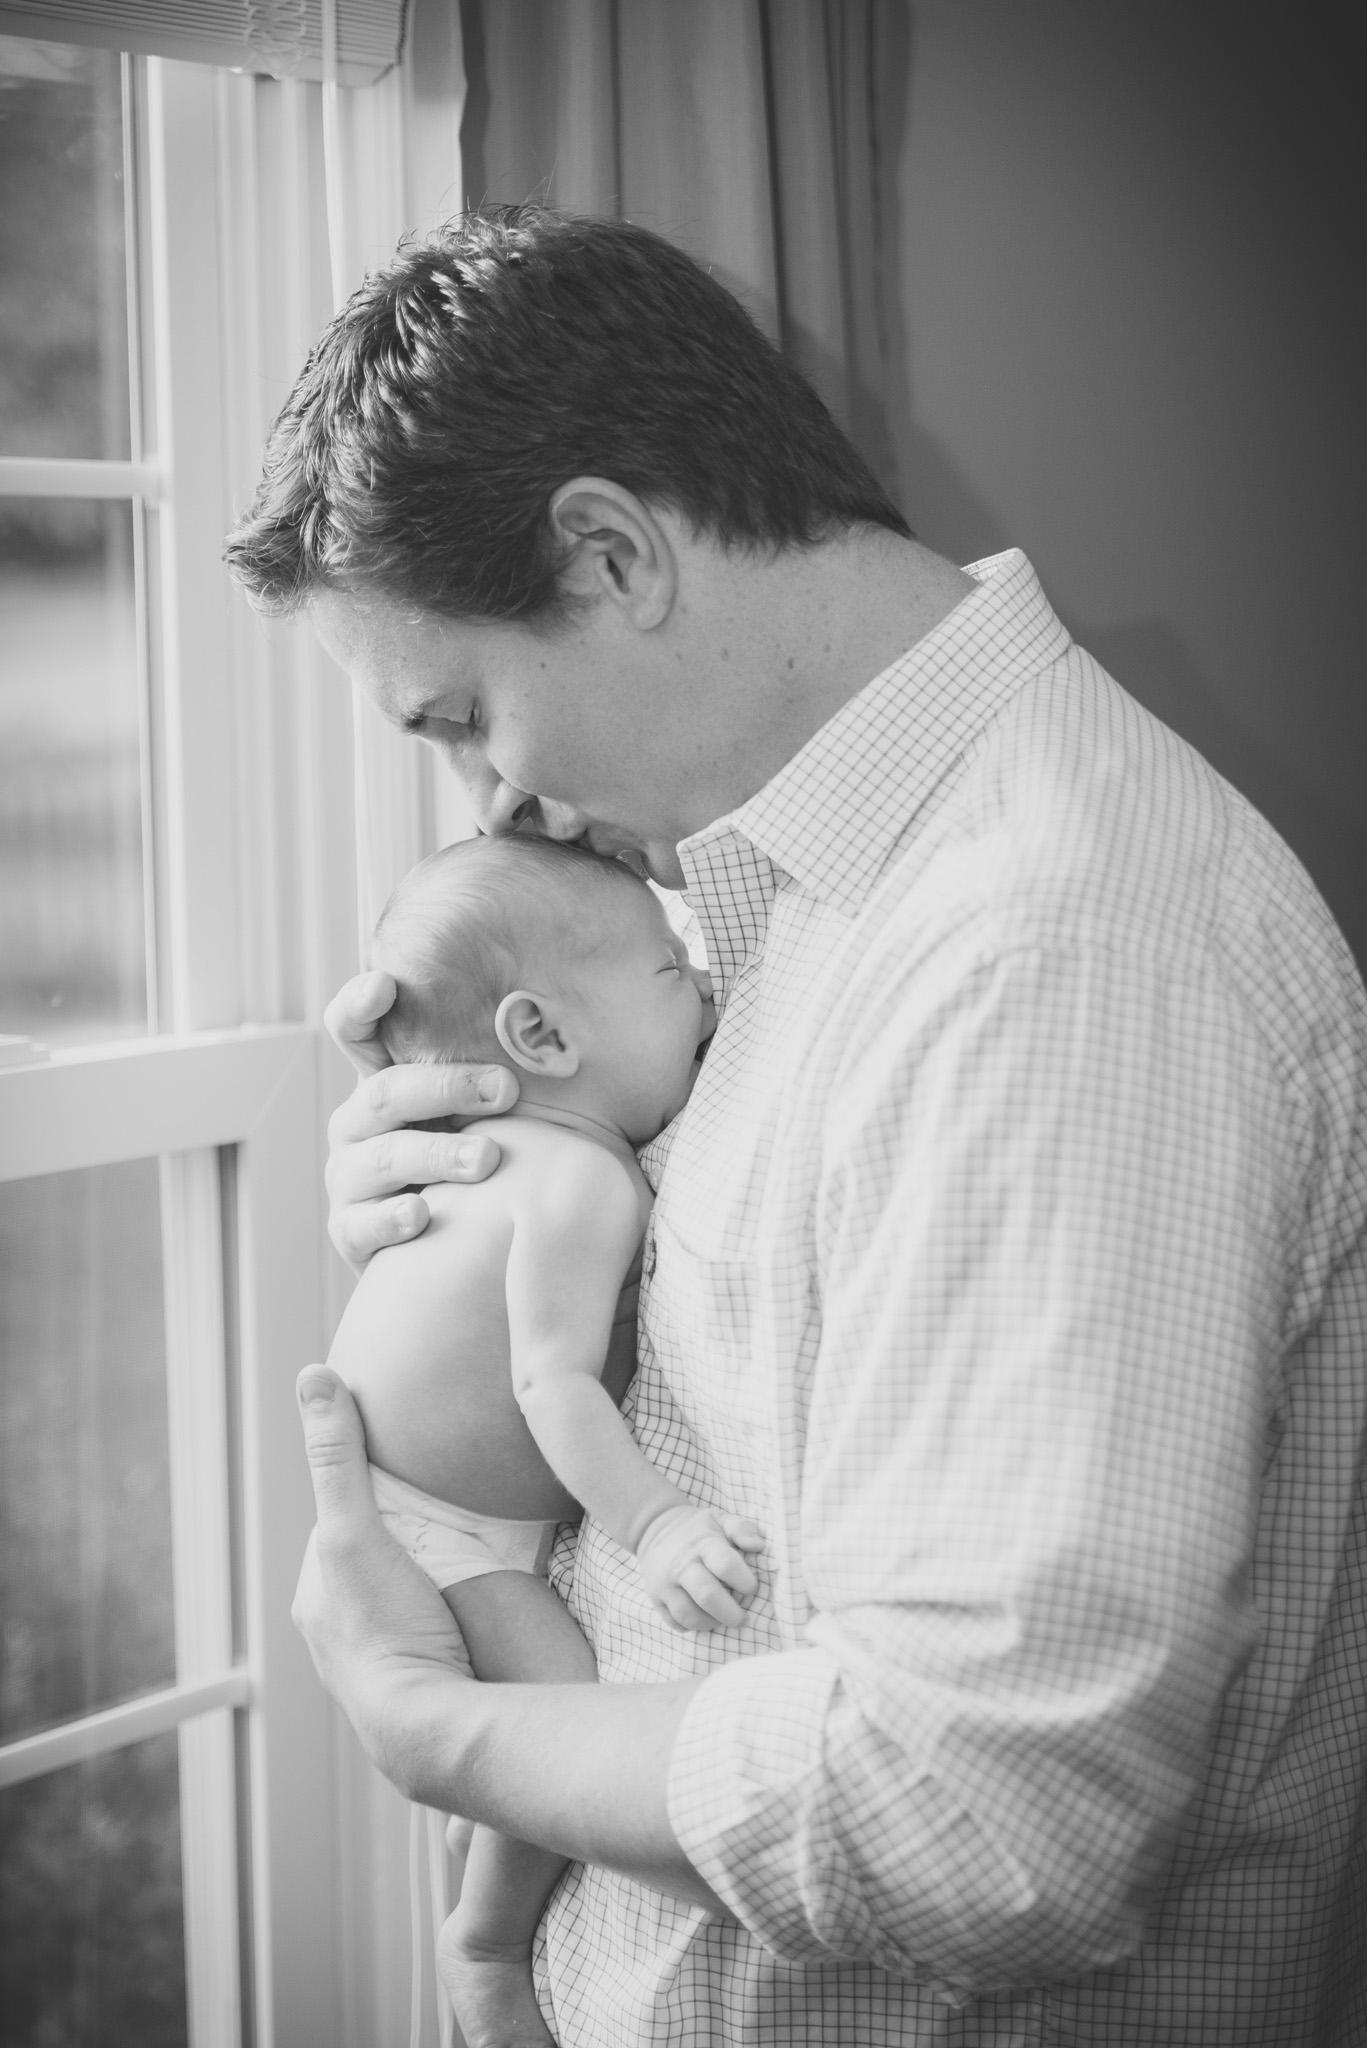 lifestyle_session_newborn_family_home_lynhcburg_va_photographers012.jpg